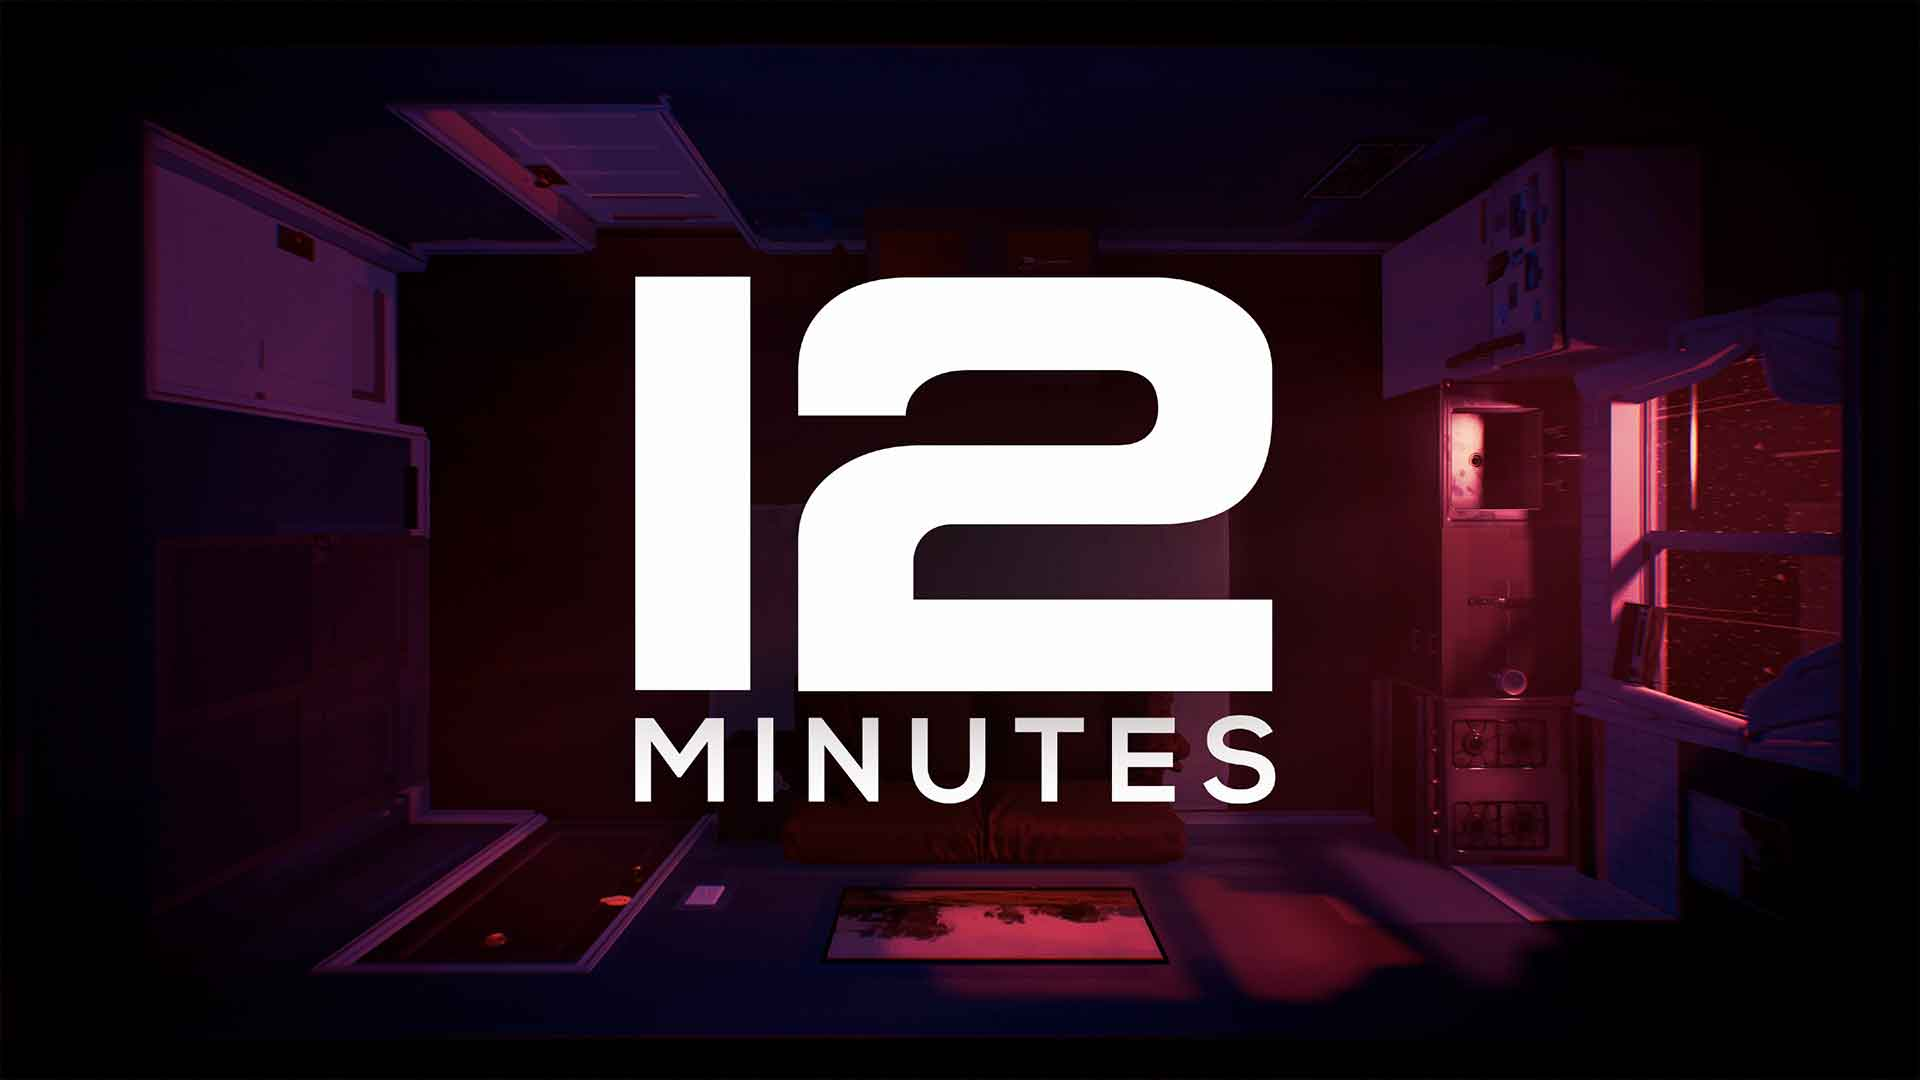 Twelve Minutes, GamersRD